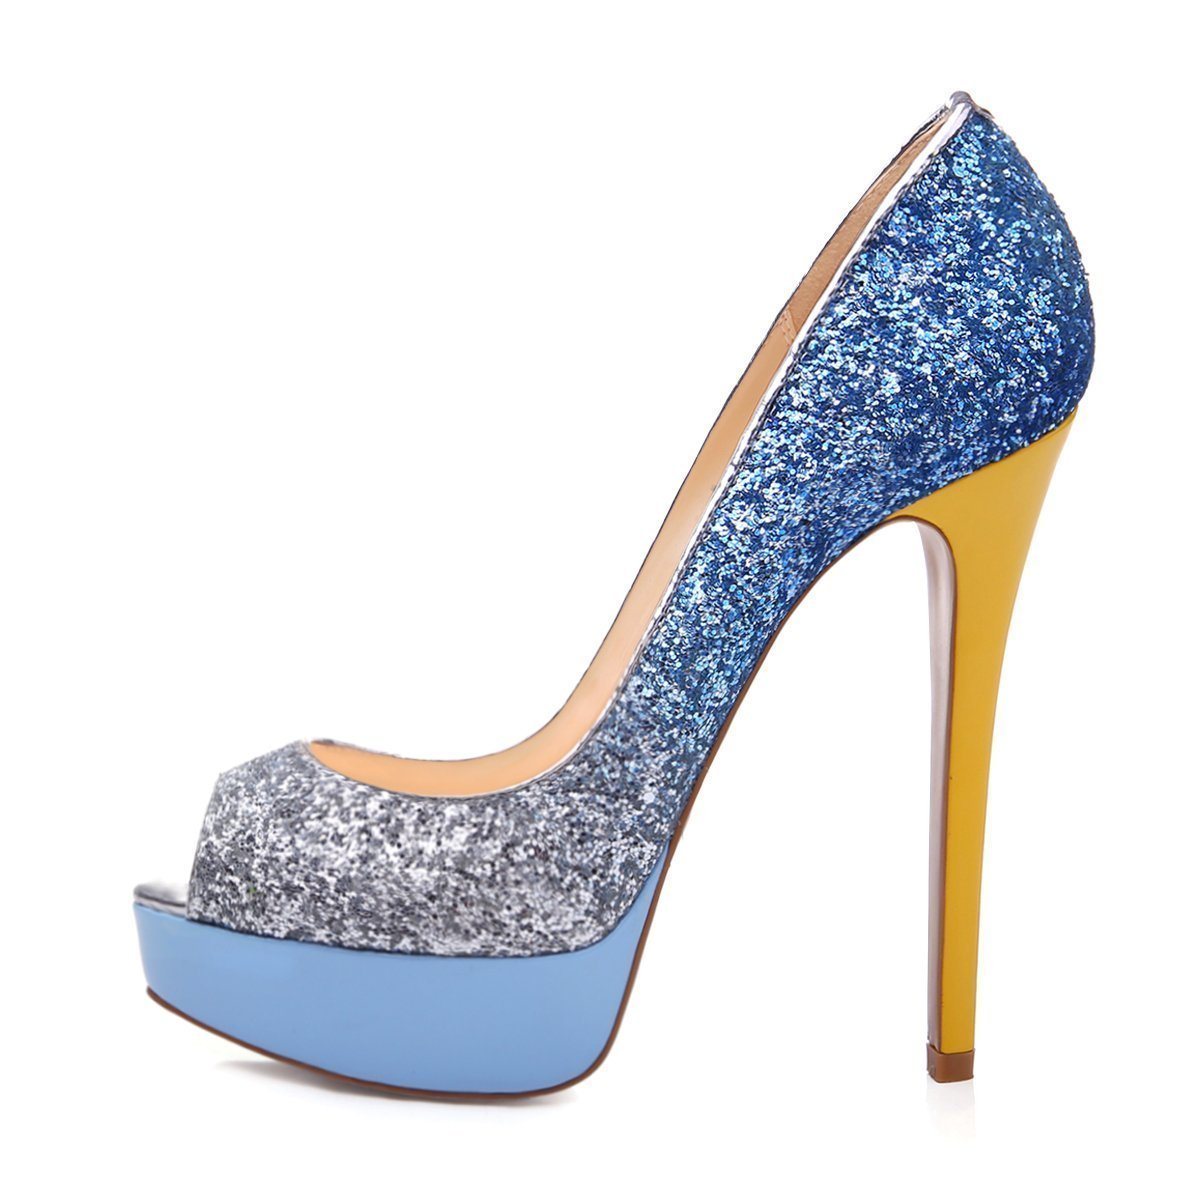 UBeauty Damen Pumps Stilettos High Heels Peep Blau Toe Glitzer Übergröße Sandalens mit Plateau Mehrfarbig Blau Peep dfc231